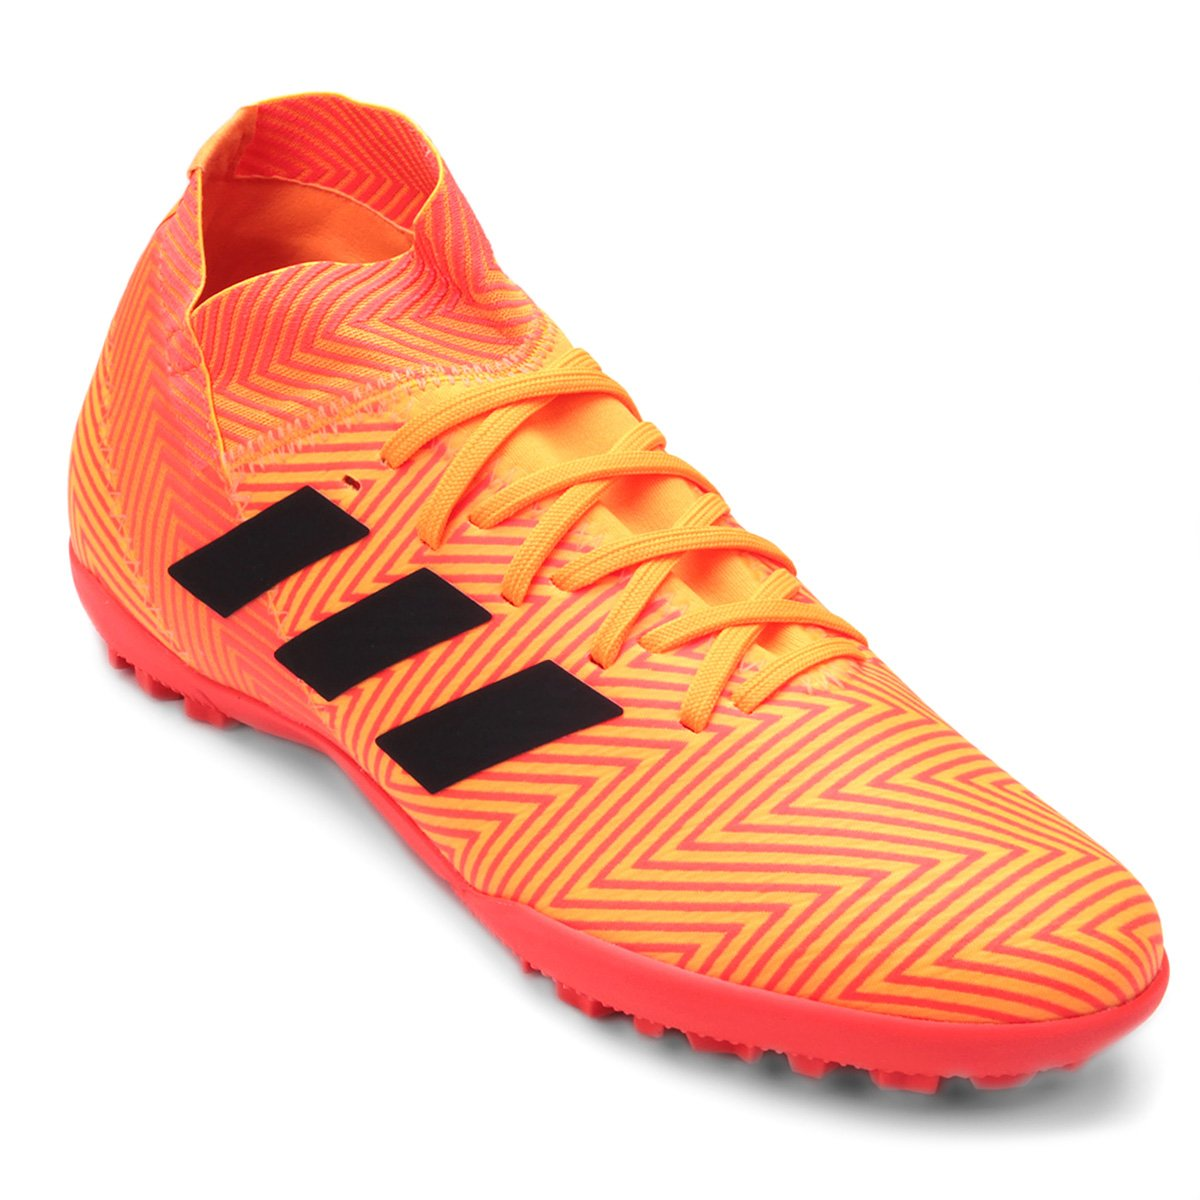 4cc9cd4b7bd Chuteira Society Adidas Nemeziz Tango 18 3 TF - Laranja e Preto - Compre  Agora